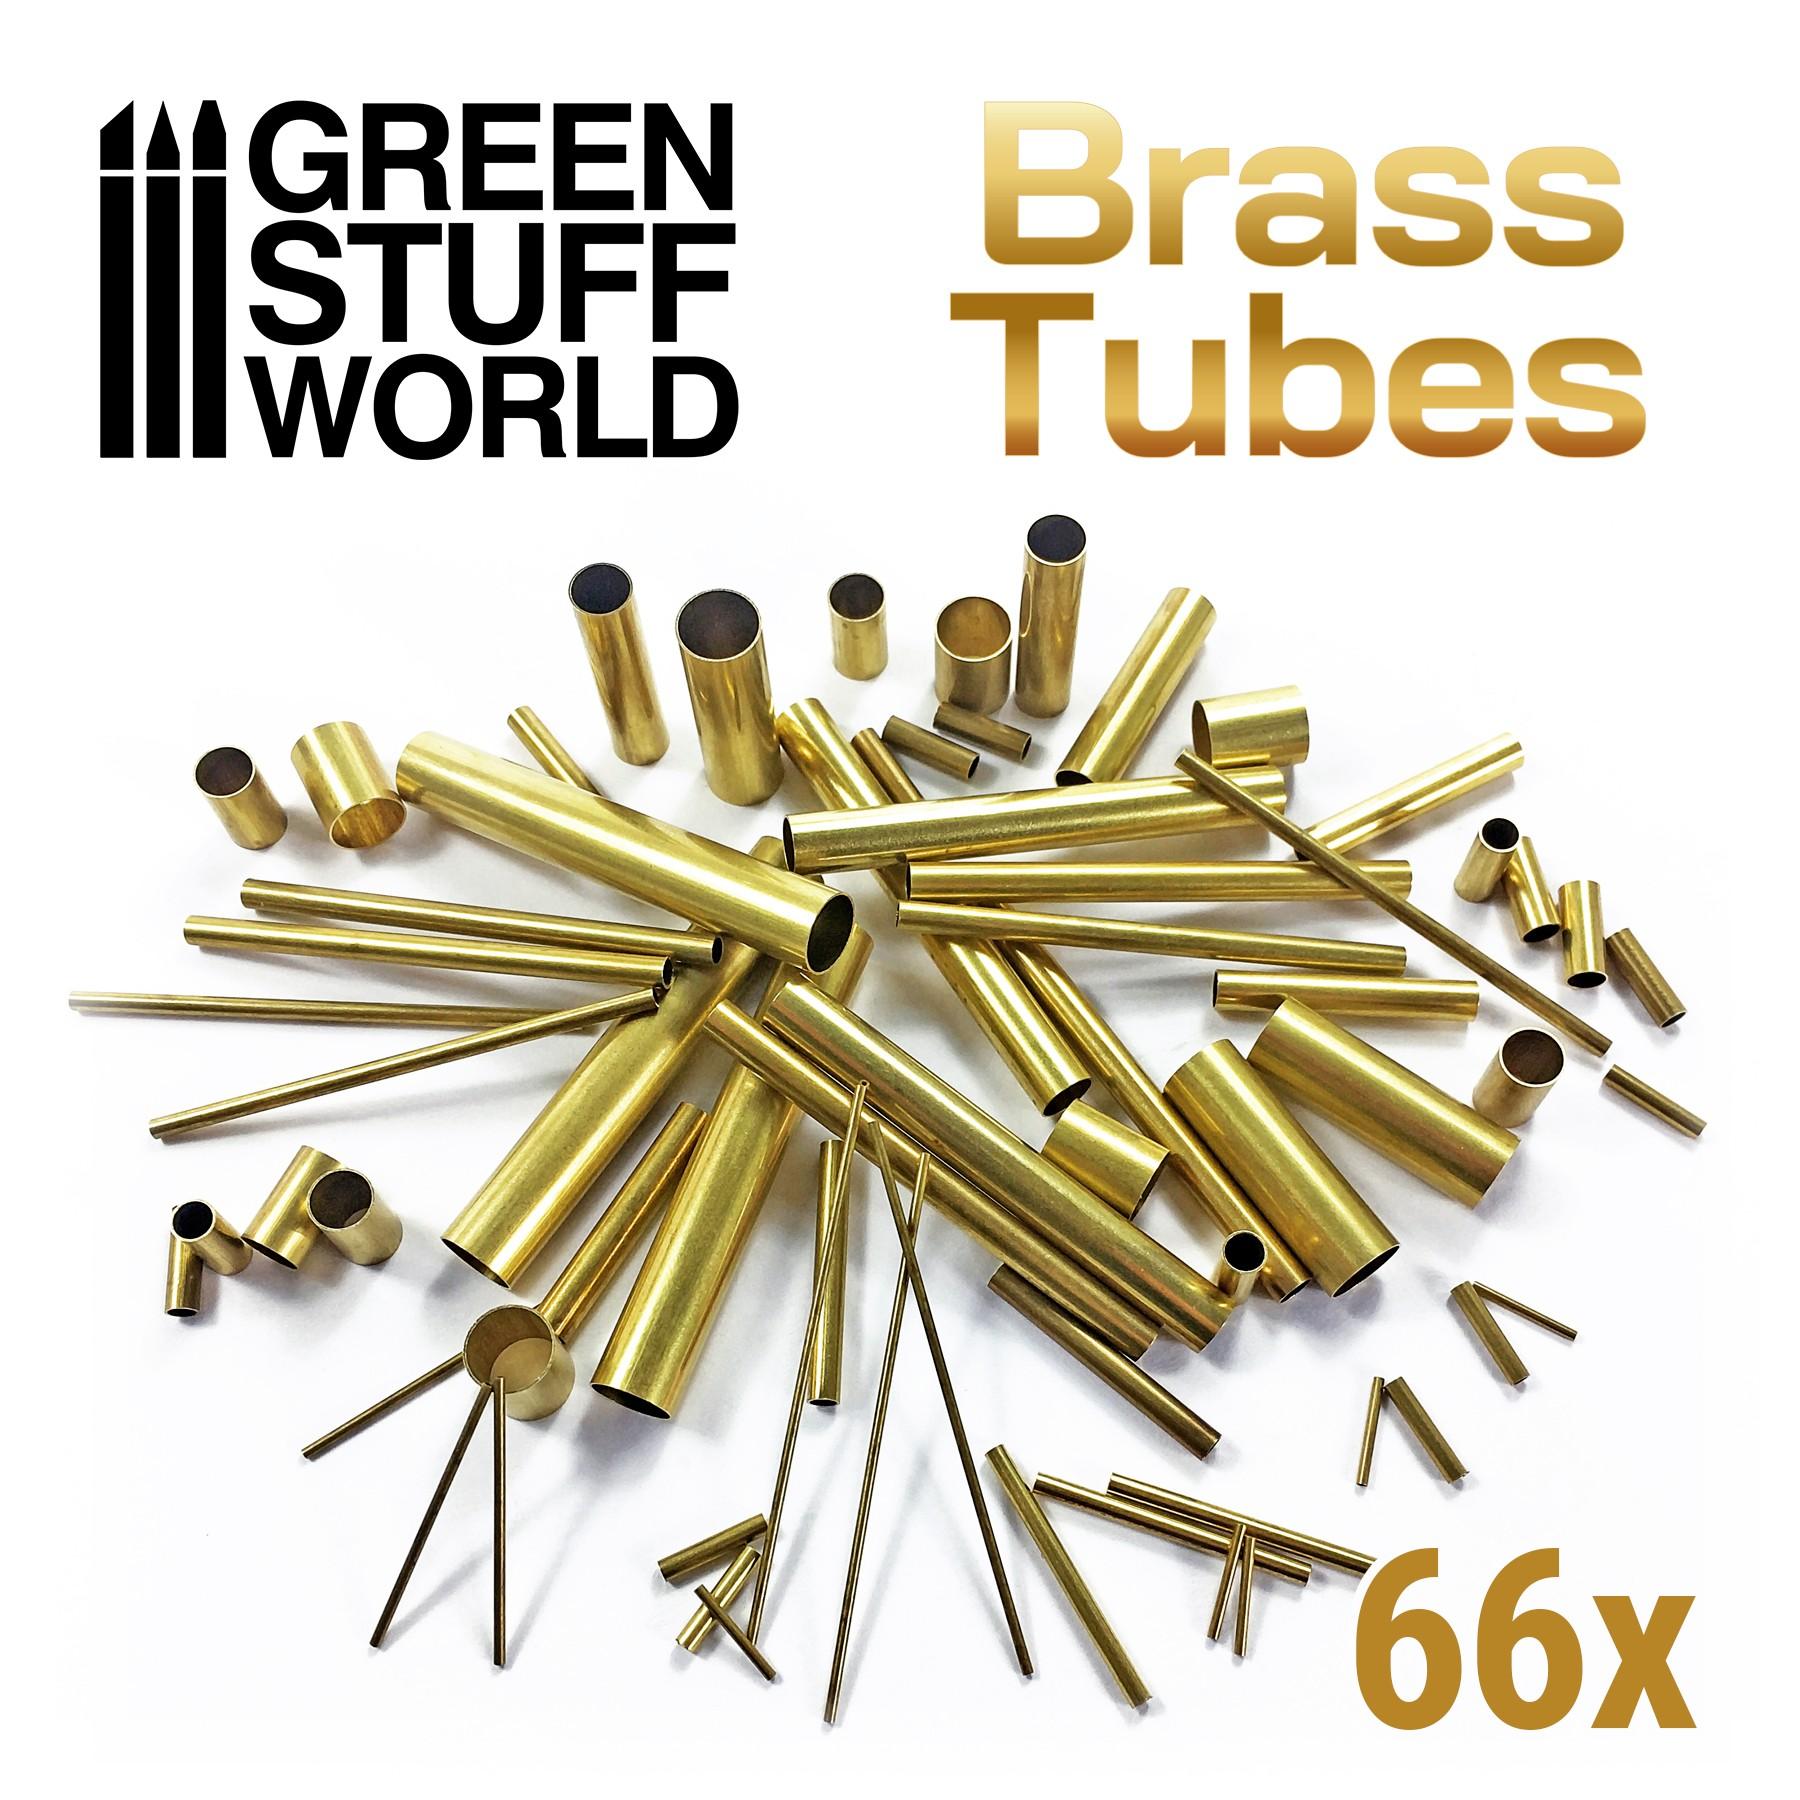 cuzn37 500/mm alliage ms63/ B /& T m/étal tube laiton /Ø 6,0/x 0,5/mm rond/ /Longueur env